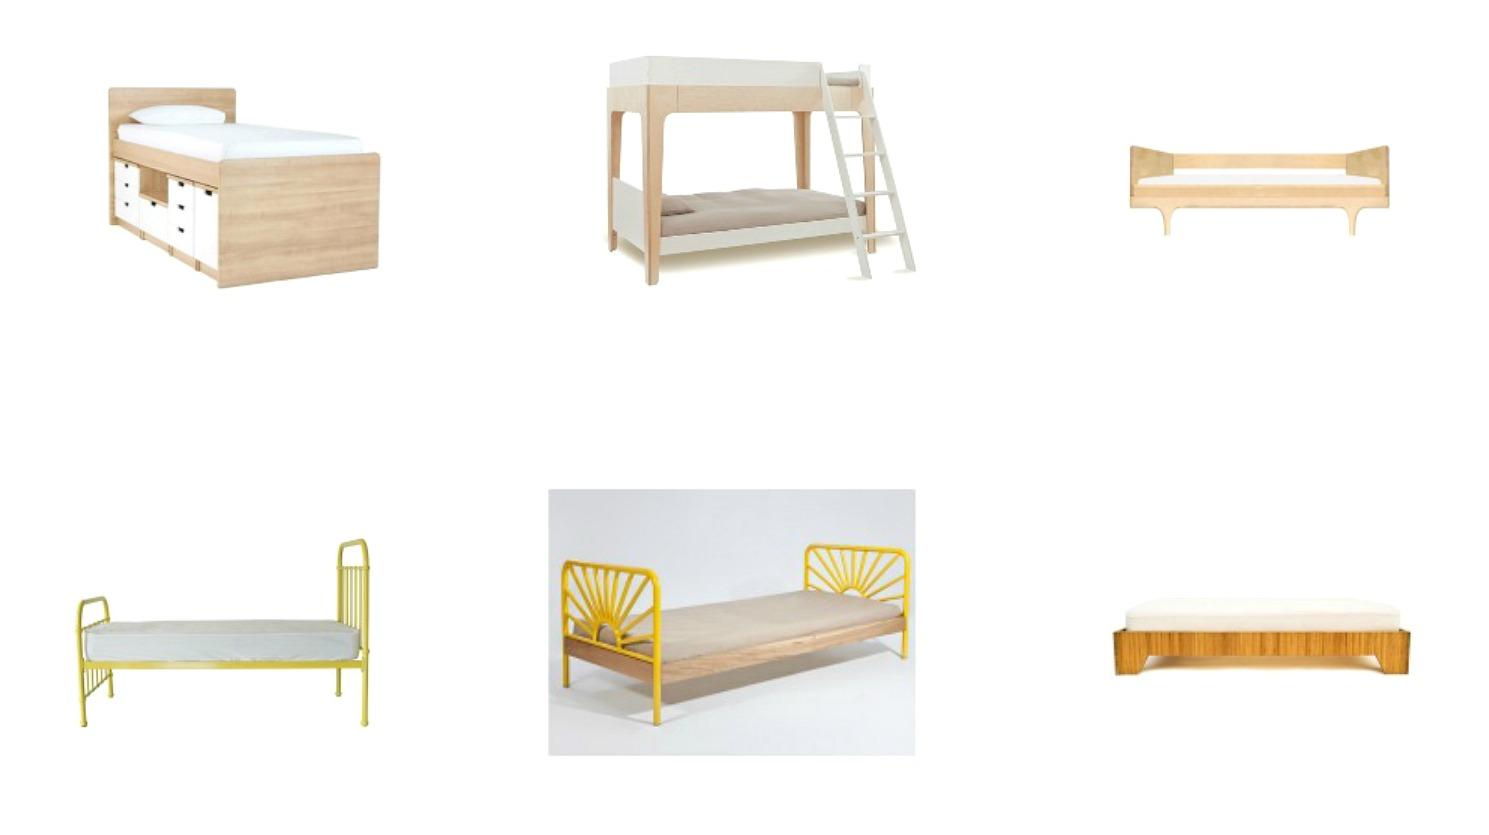 Floor Bed Wonderful Home Bedroom Interior Design With